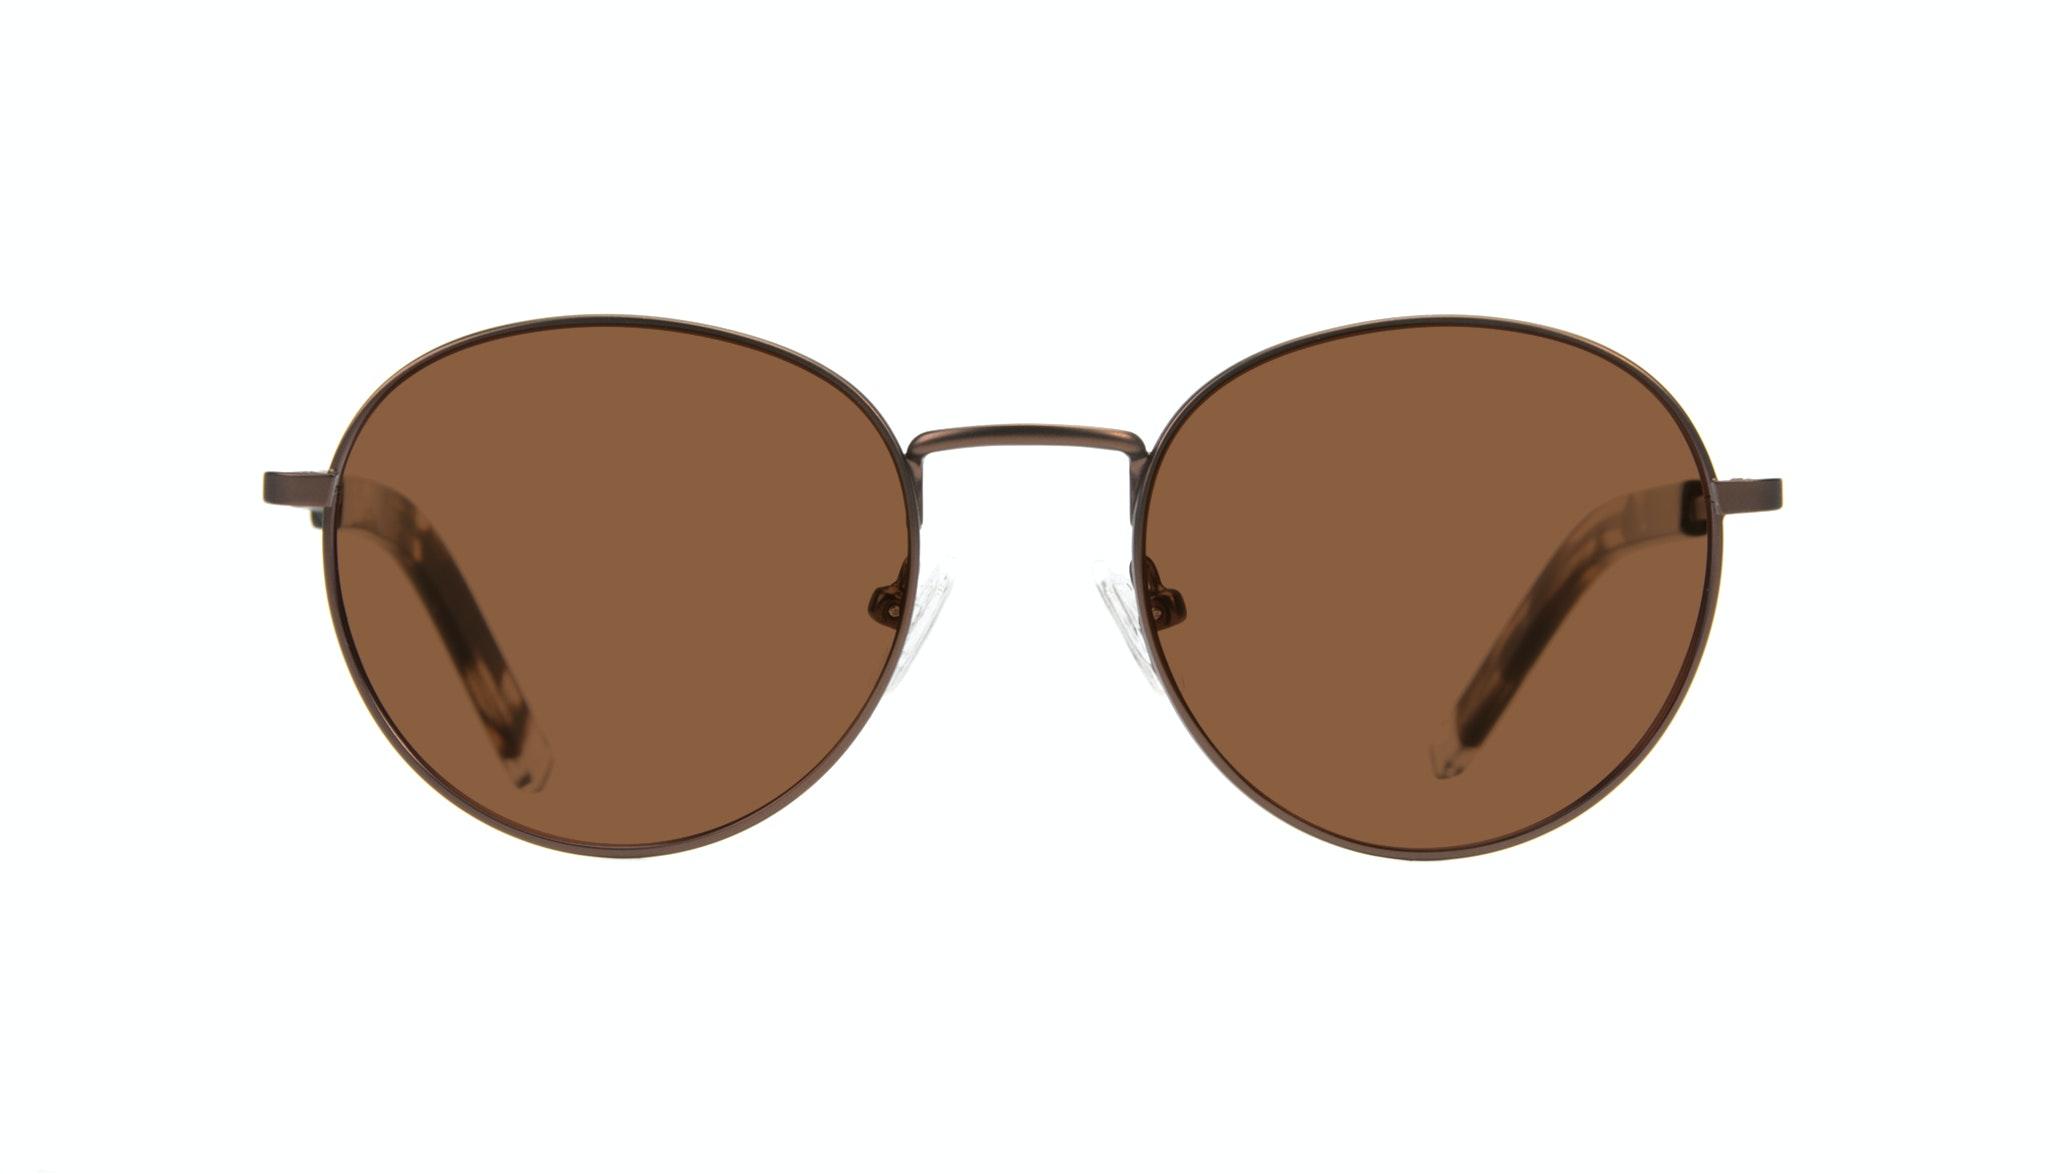 Affordable Fashion Glasses Round Sunglasses Men Lean Mud